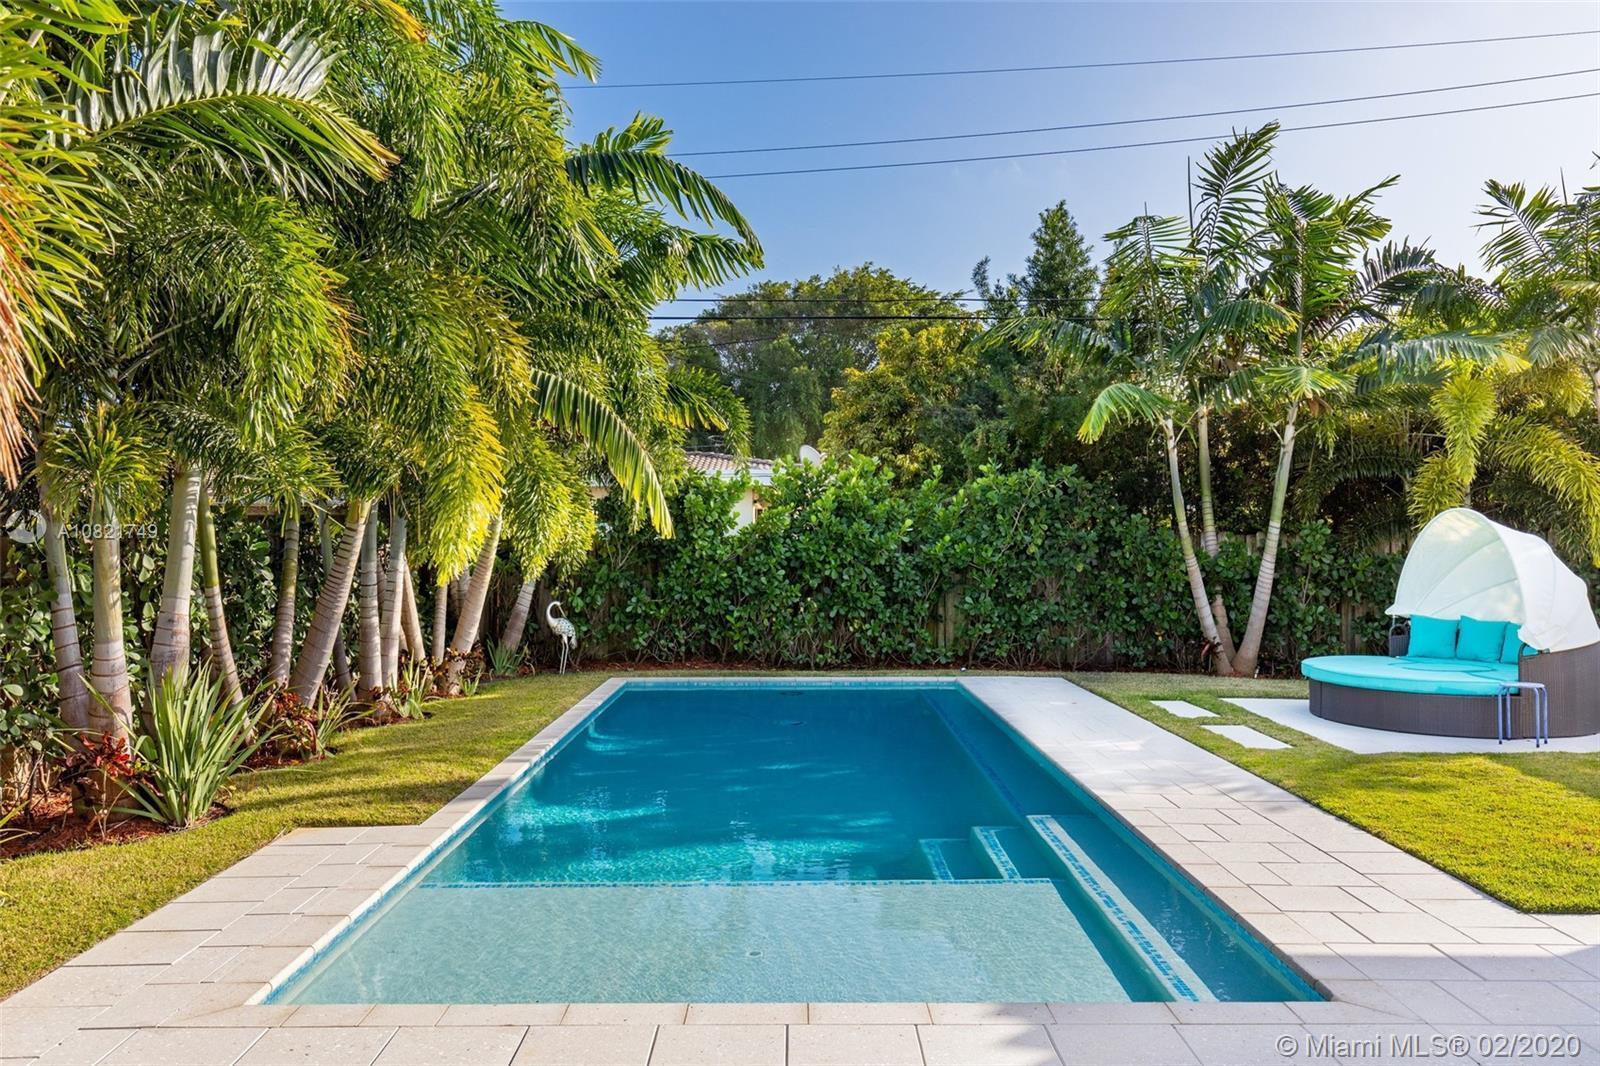 Charming 3 BD 2.5 BA family home in gated Normandy Shores on Miami Beach. Enjoy an abundance of natu